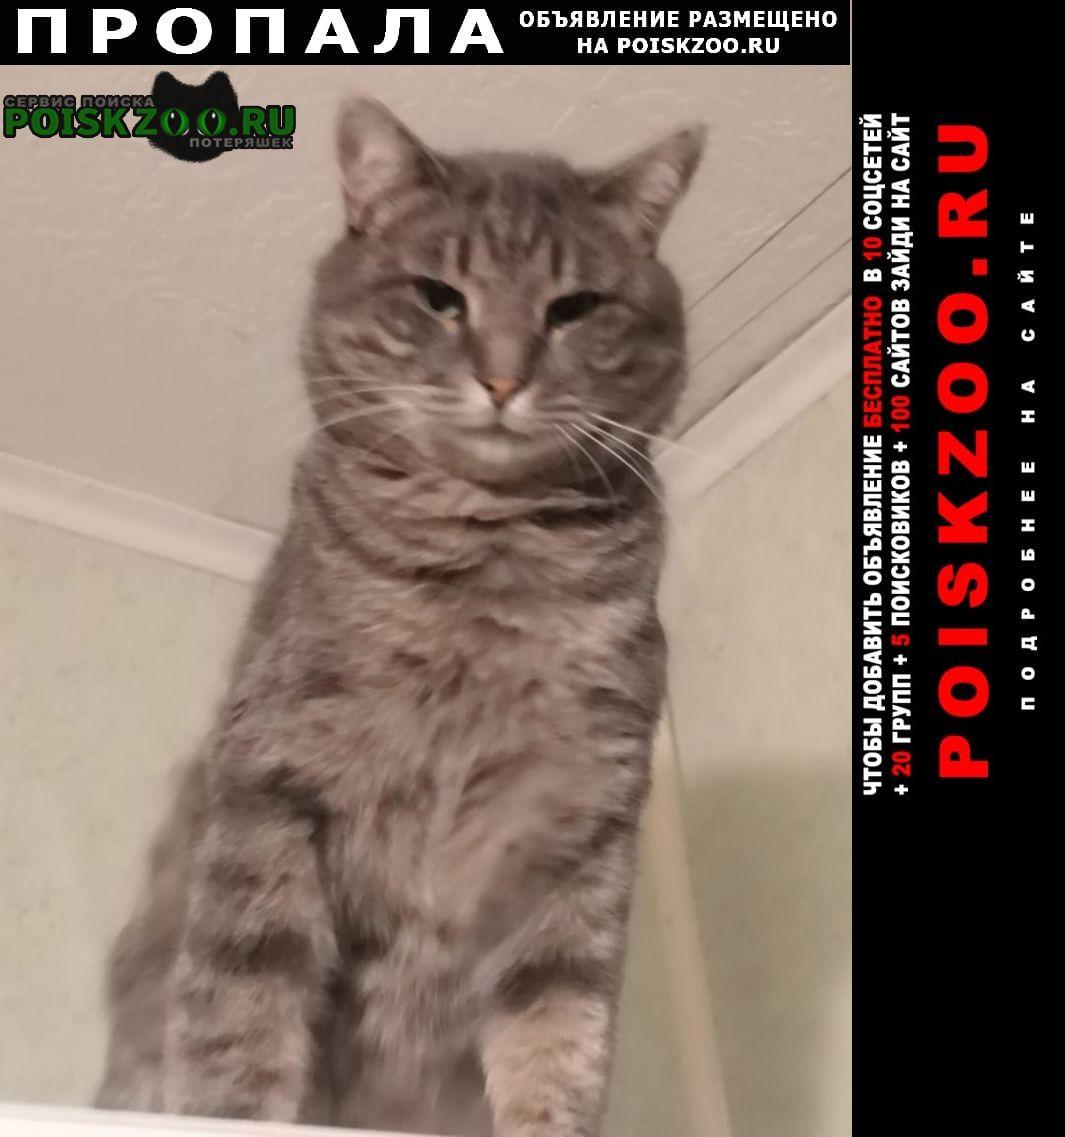 Пропал кот большой серый Старый Оскол